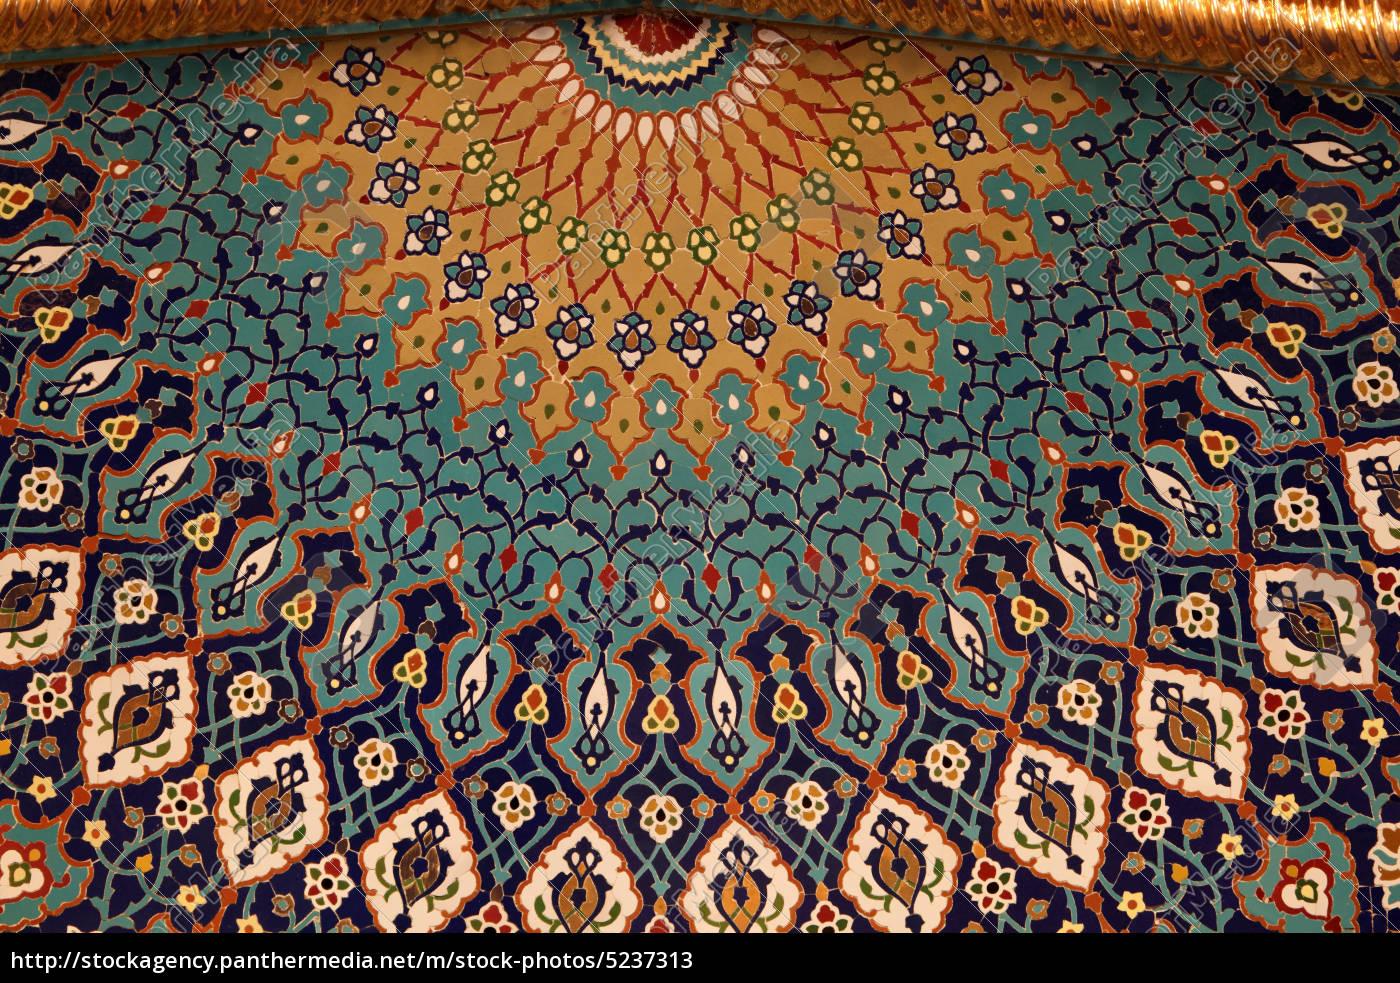 orientalische mosaik ornamente stockfoto 5237313 bildagentur panthermedia. Black Bedroom Furniture Sets. Home Design Ideas